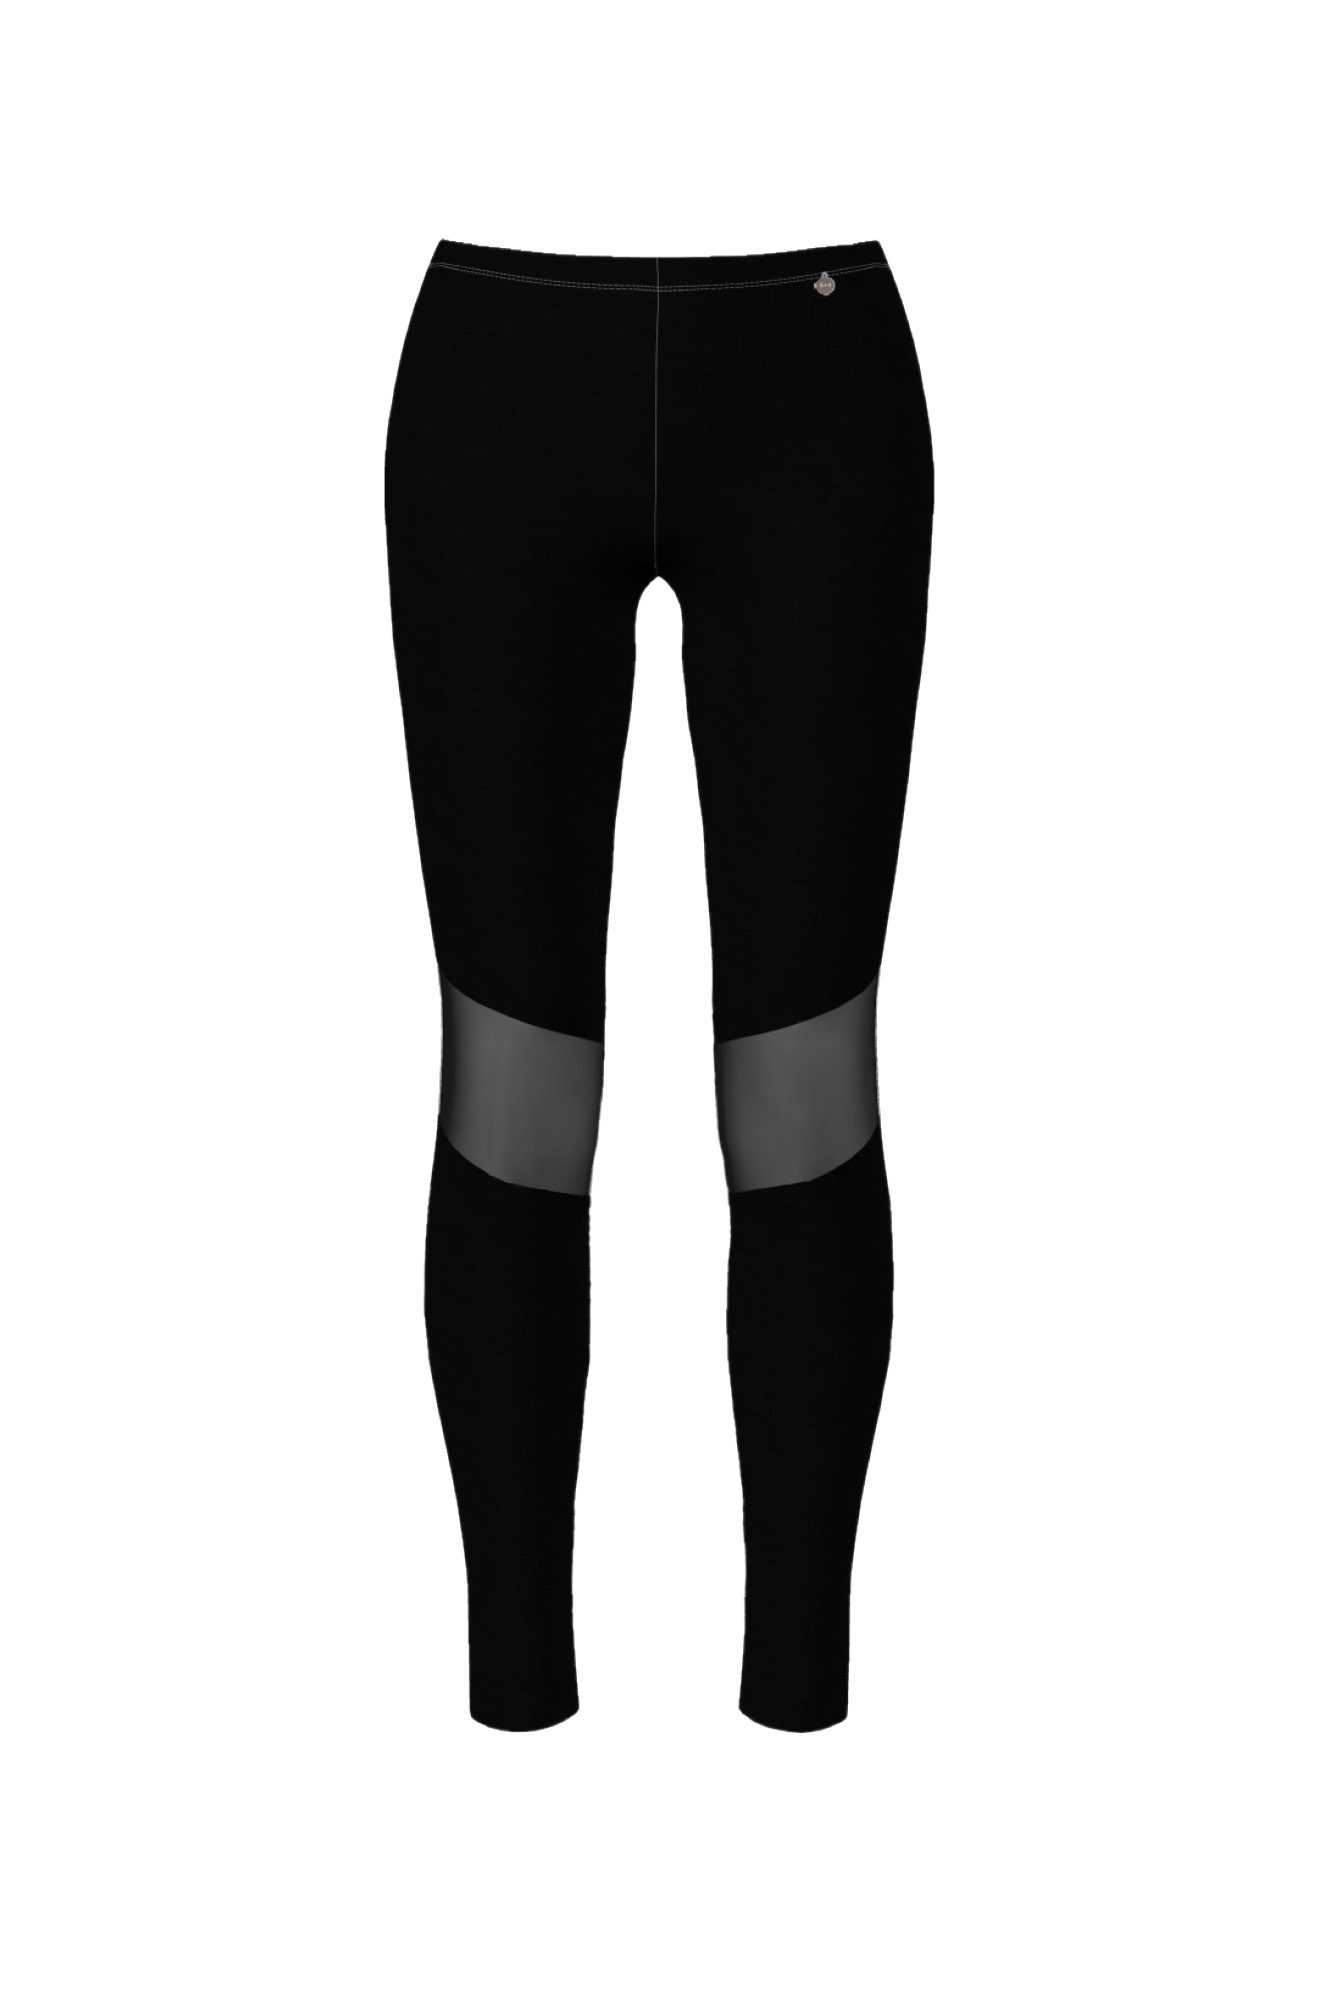 Vamp - Dámske legíny 13859 - Vamp black s